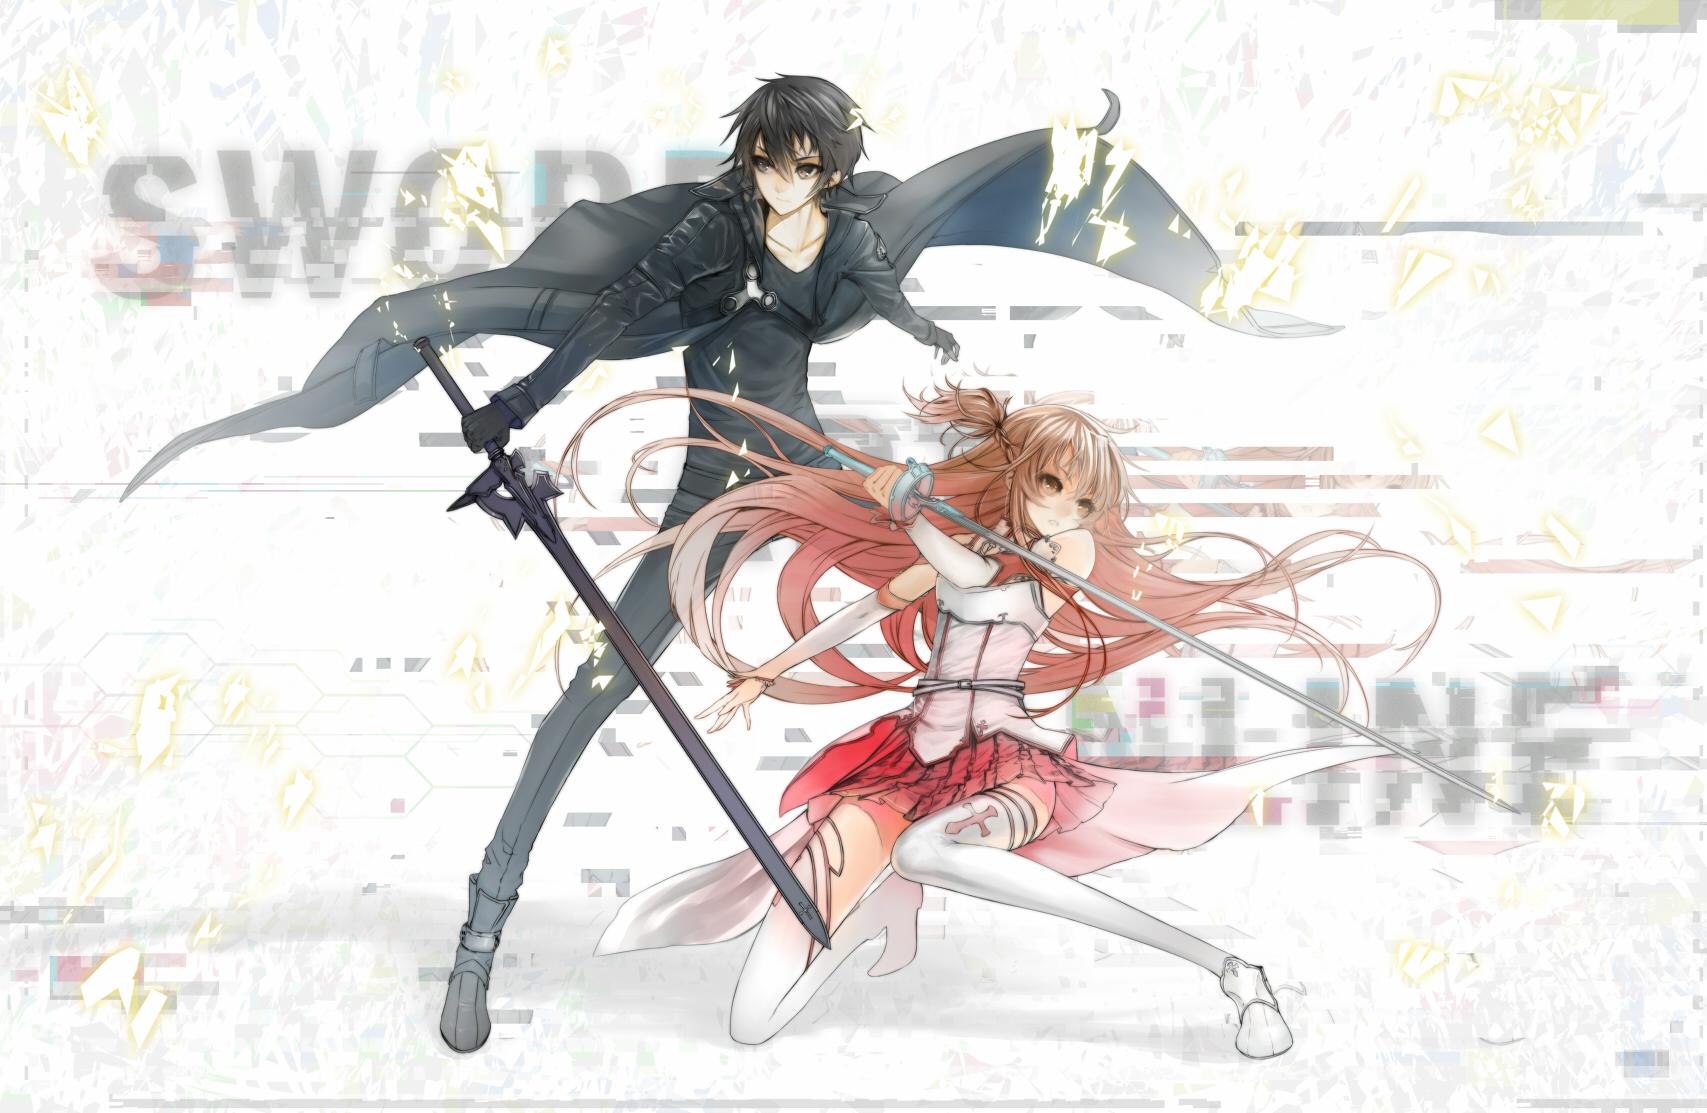 Anime minevi sword art online kirigaya kazuto yuuki asuna rapier